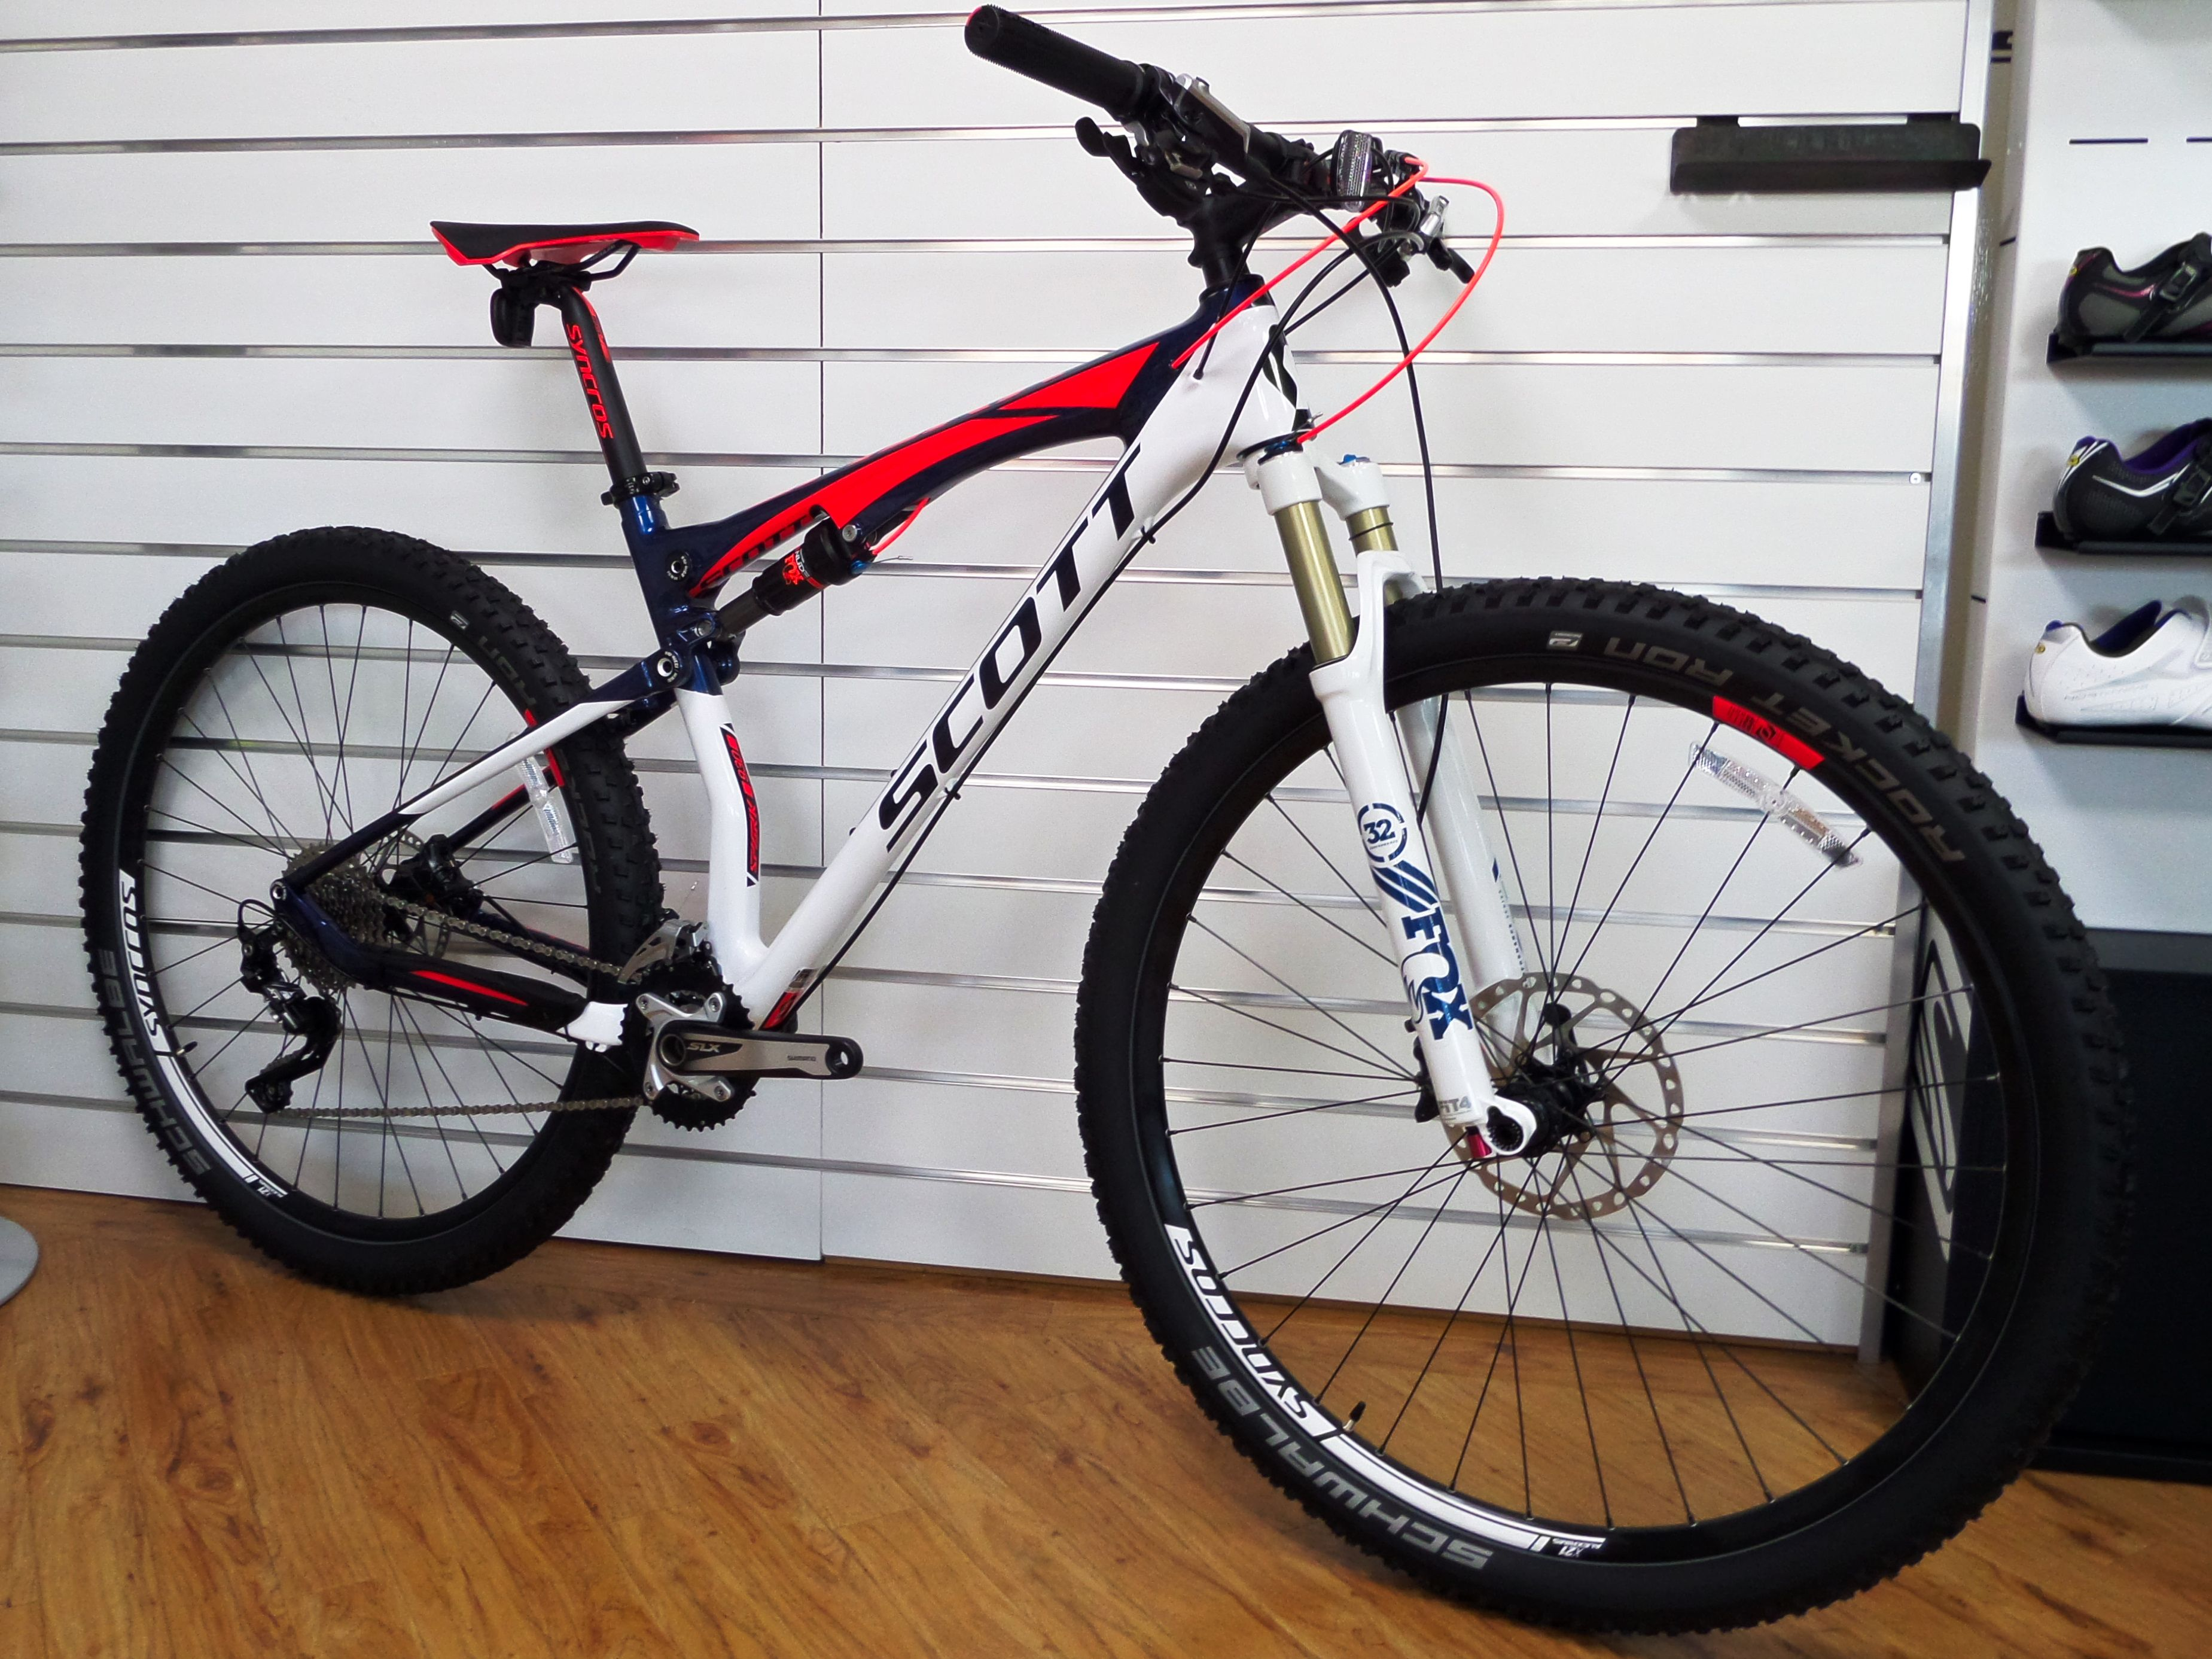 615ee291082 2016 Scott Spark 930 now in store! | Mountain Bikes | Scott bikes ...